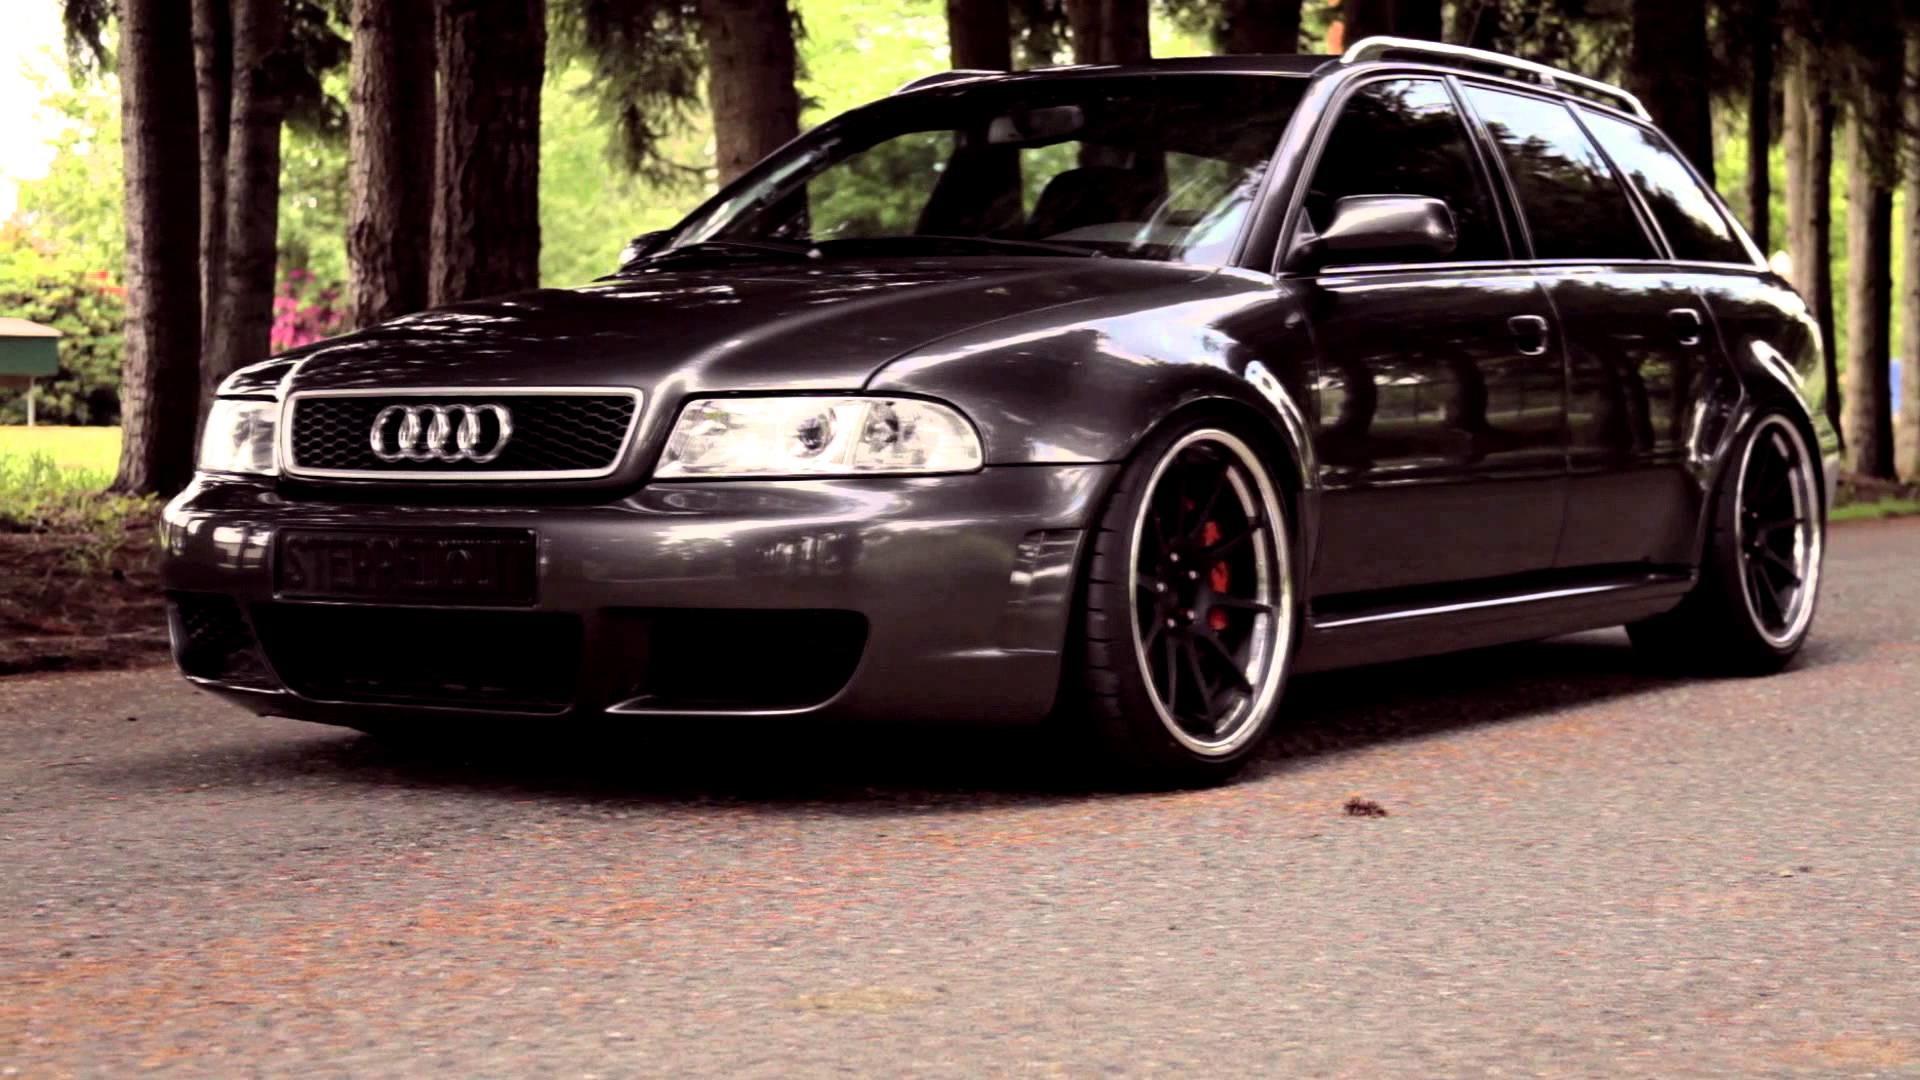 Res: 1920x1080, Audi S4 B5 Stance